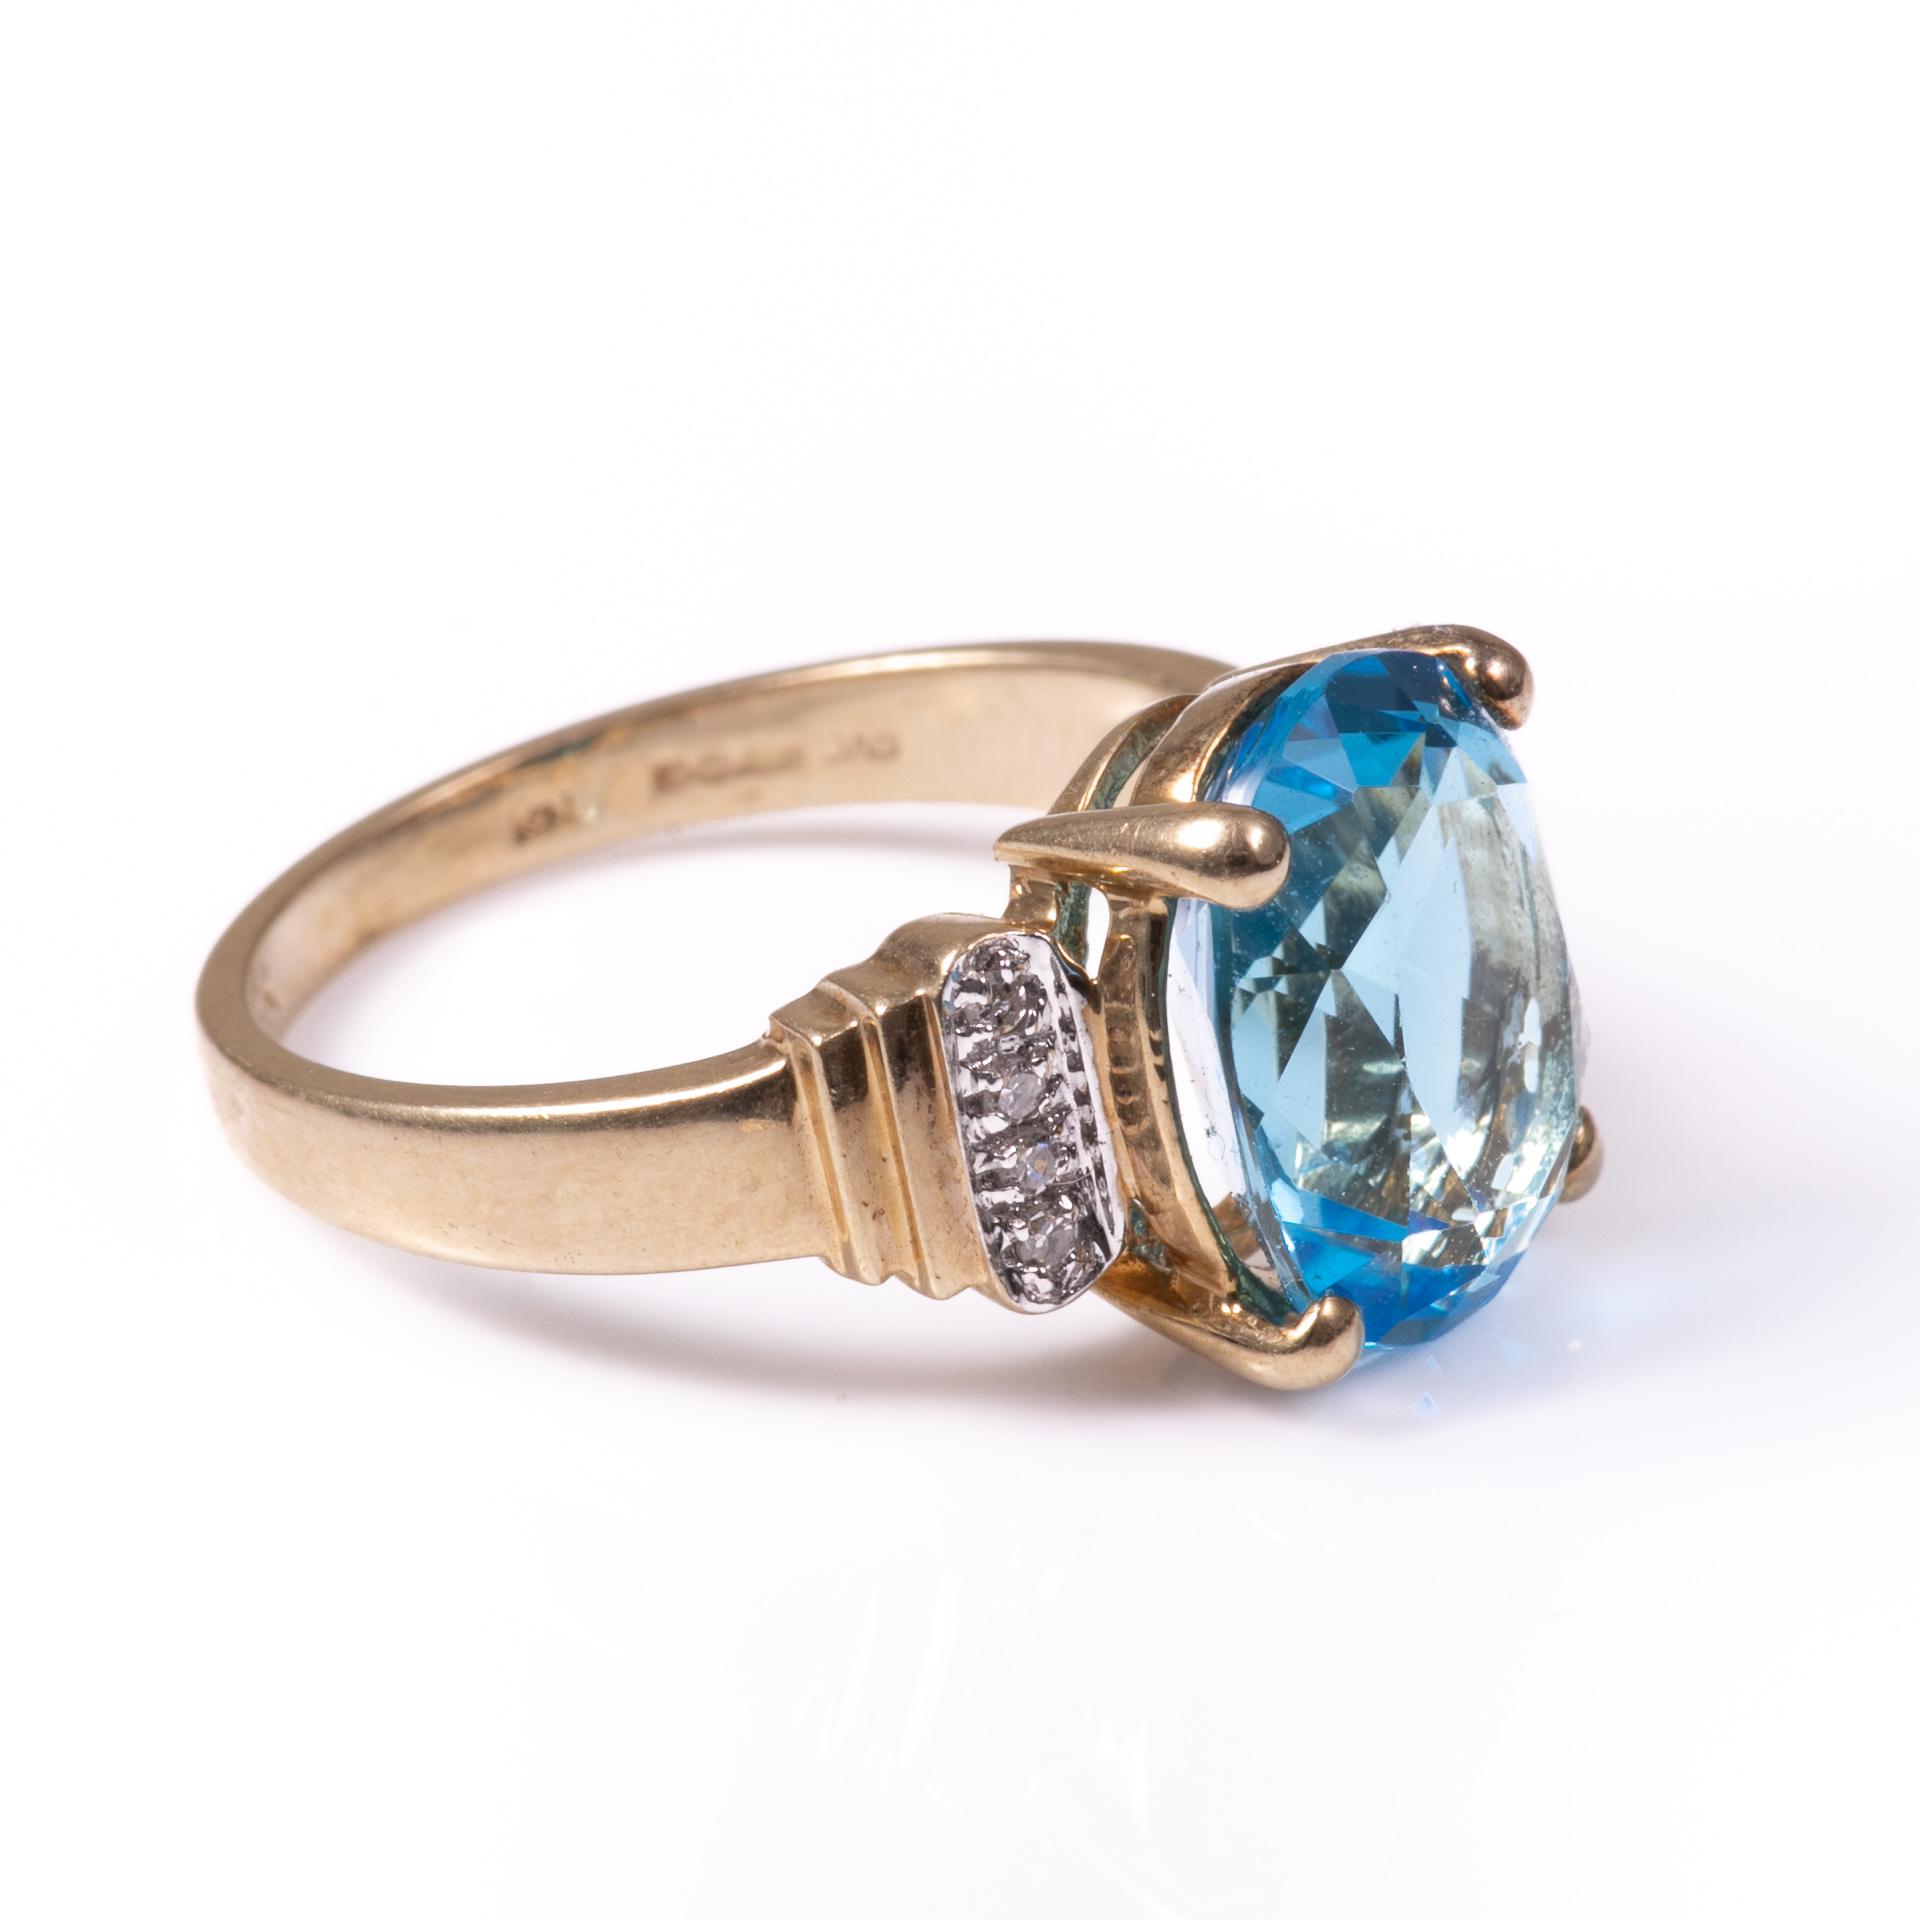 9ct Gold 4.40ct Blue Topaz & Diamond Ring - Image 5 of 6